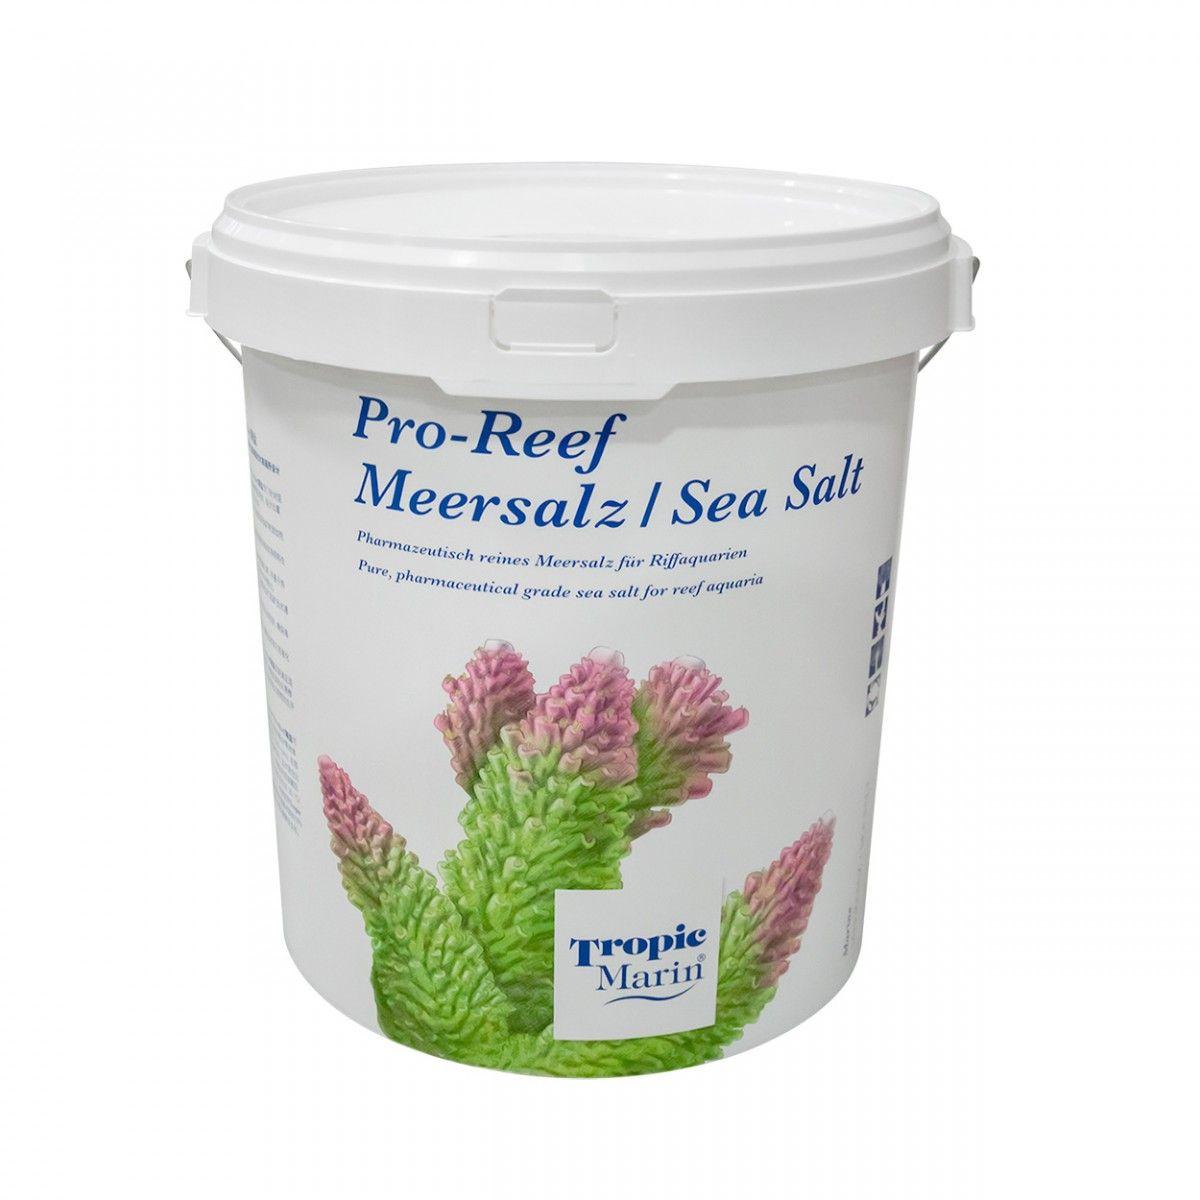 Tropic Marin Sal Pro - Reef 25kg 750 Litros